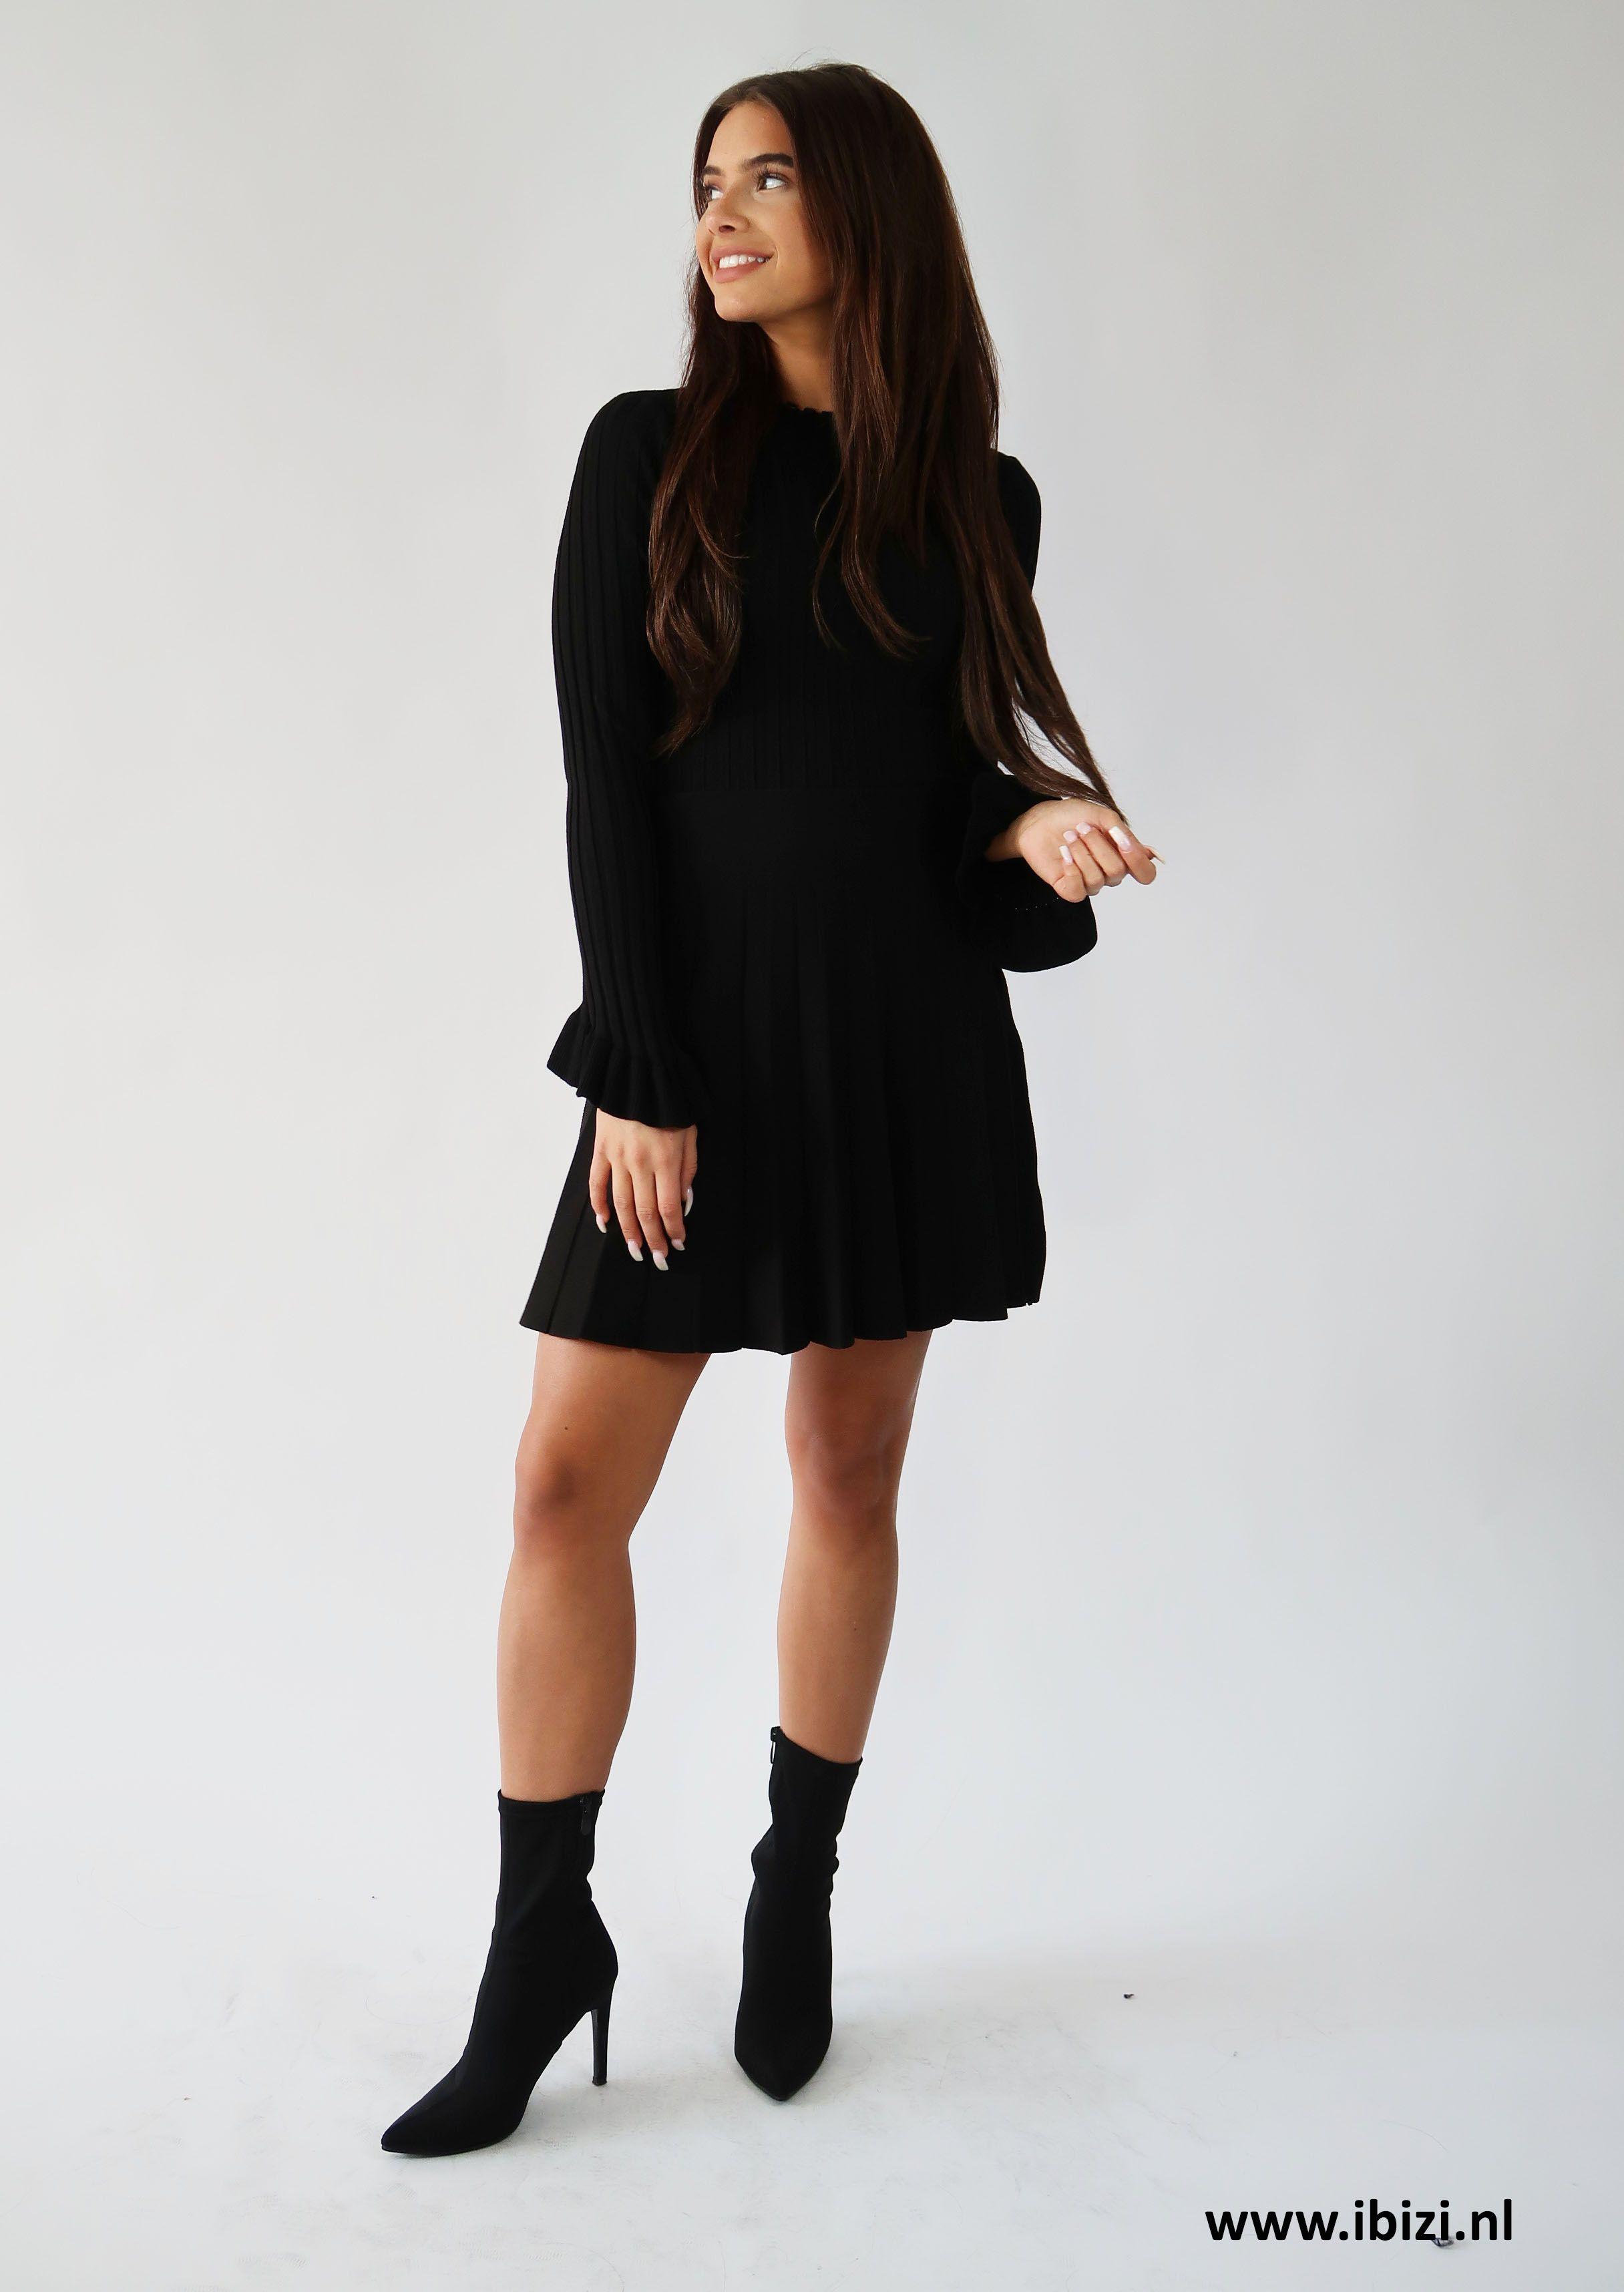 3917ff0505b656 Mooie outfit in zwart - UItlopend rokje + Ruffle Top in zwart ...